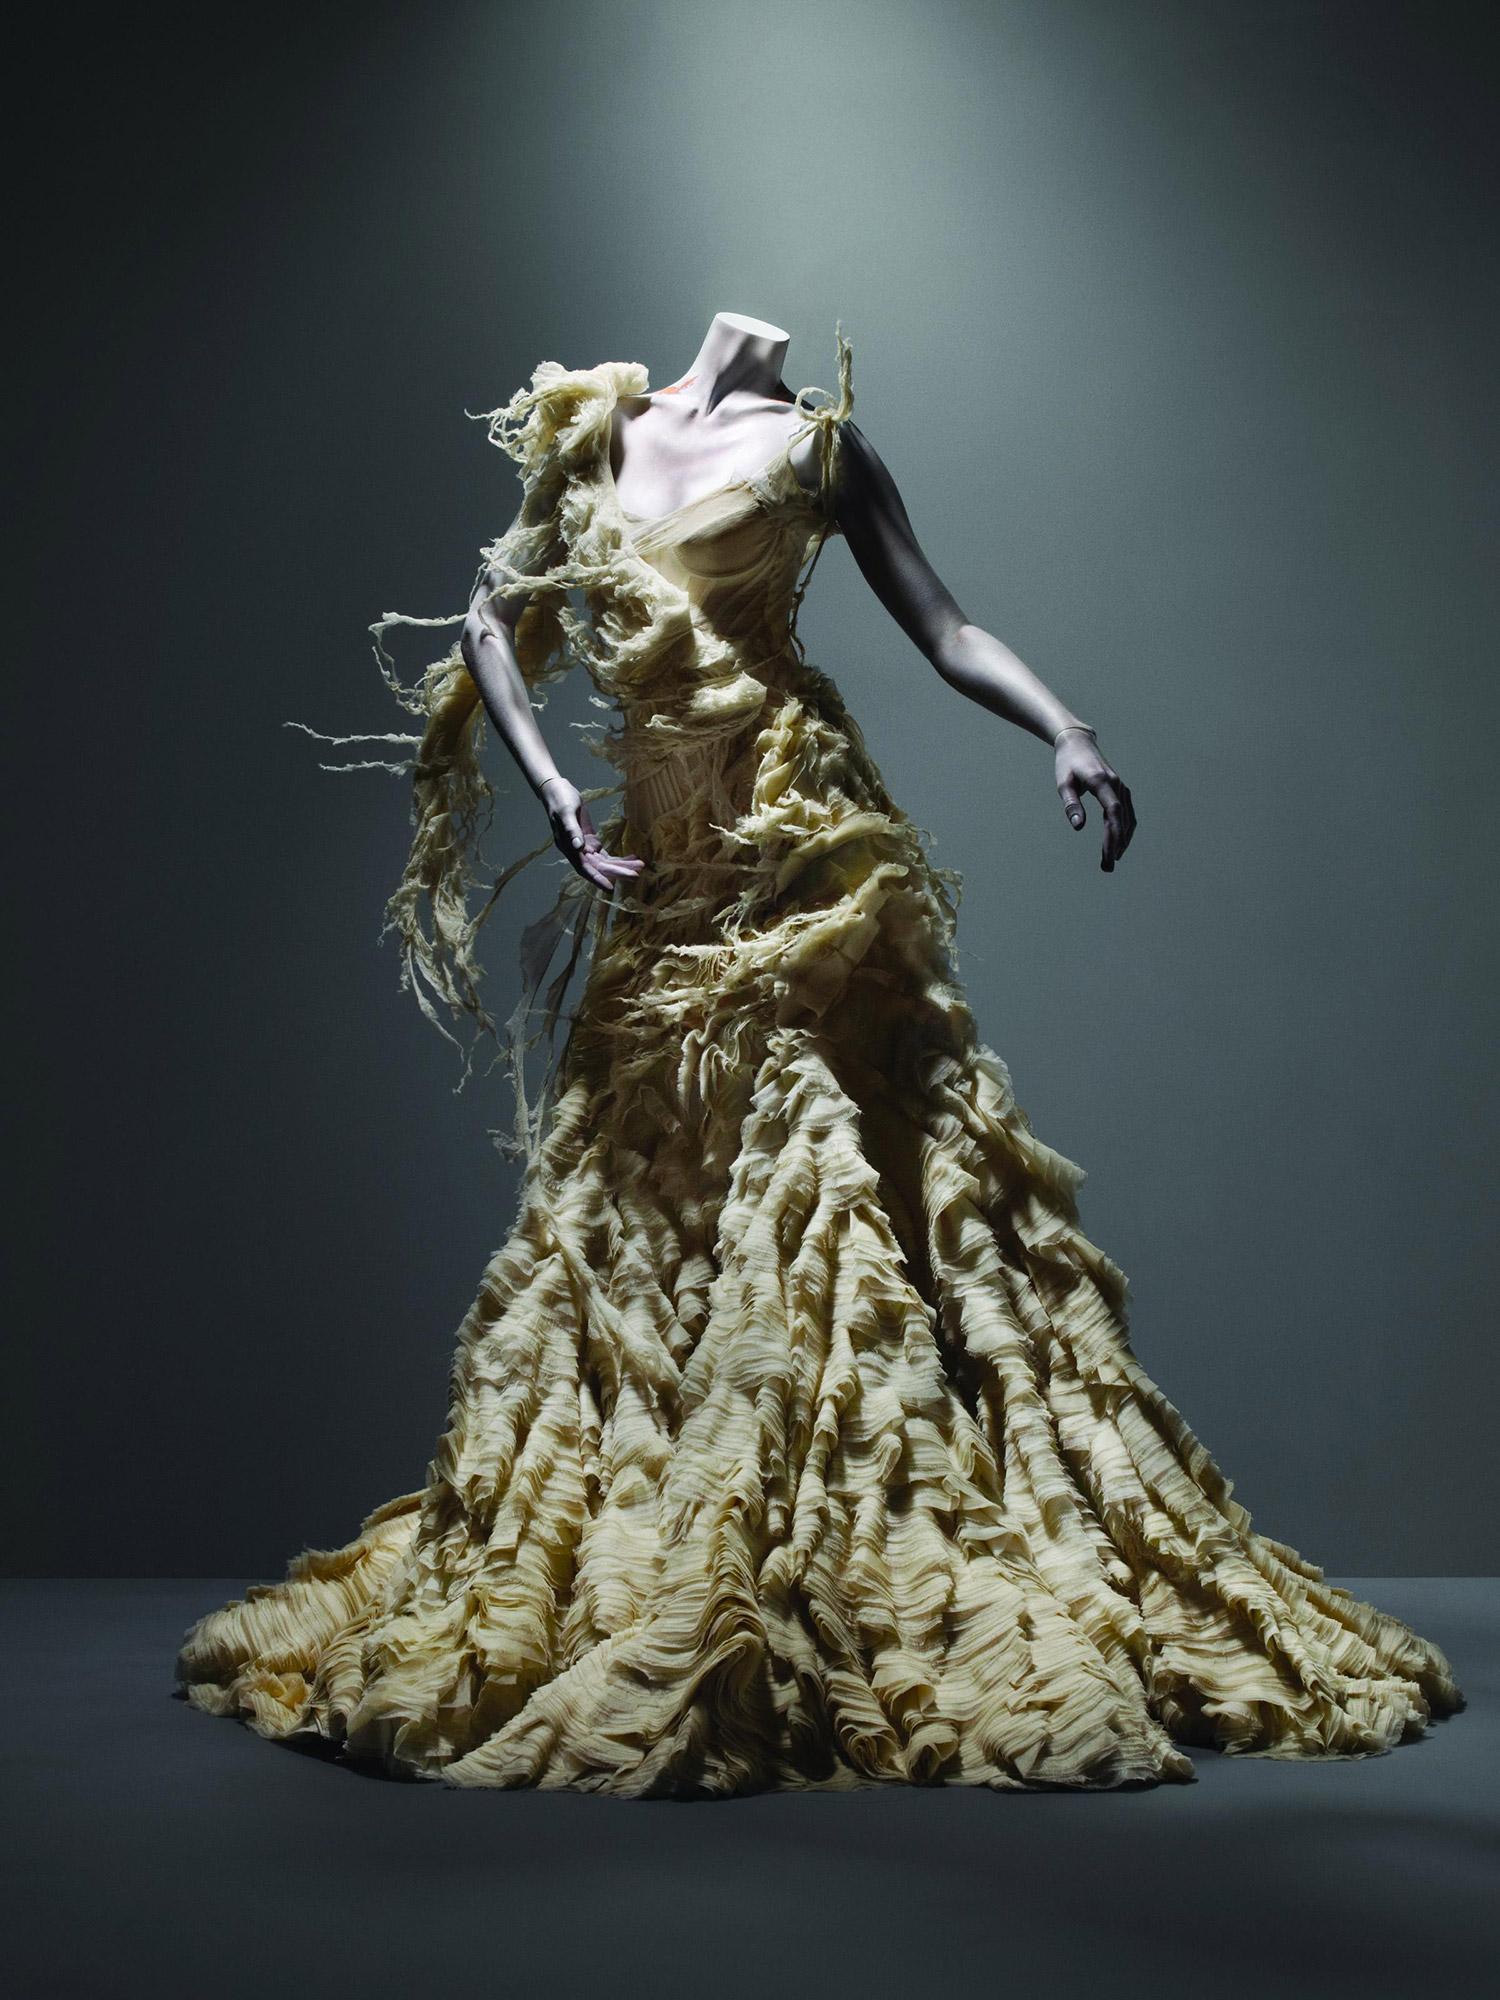 Alexander McQueen Dresses Top 10 | LDNfashion.com